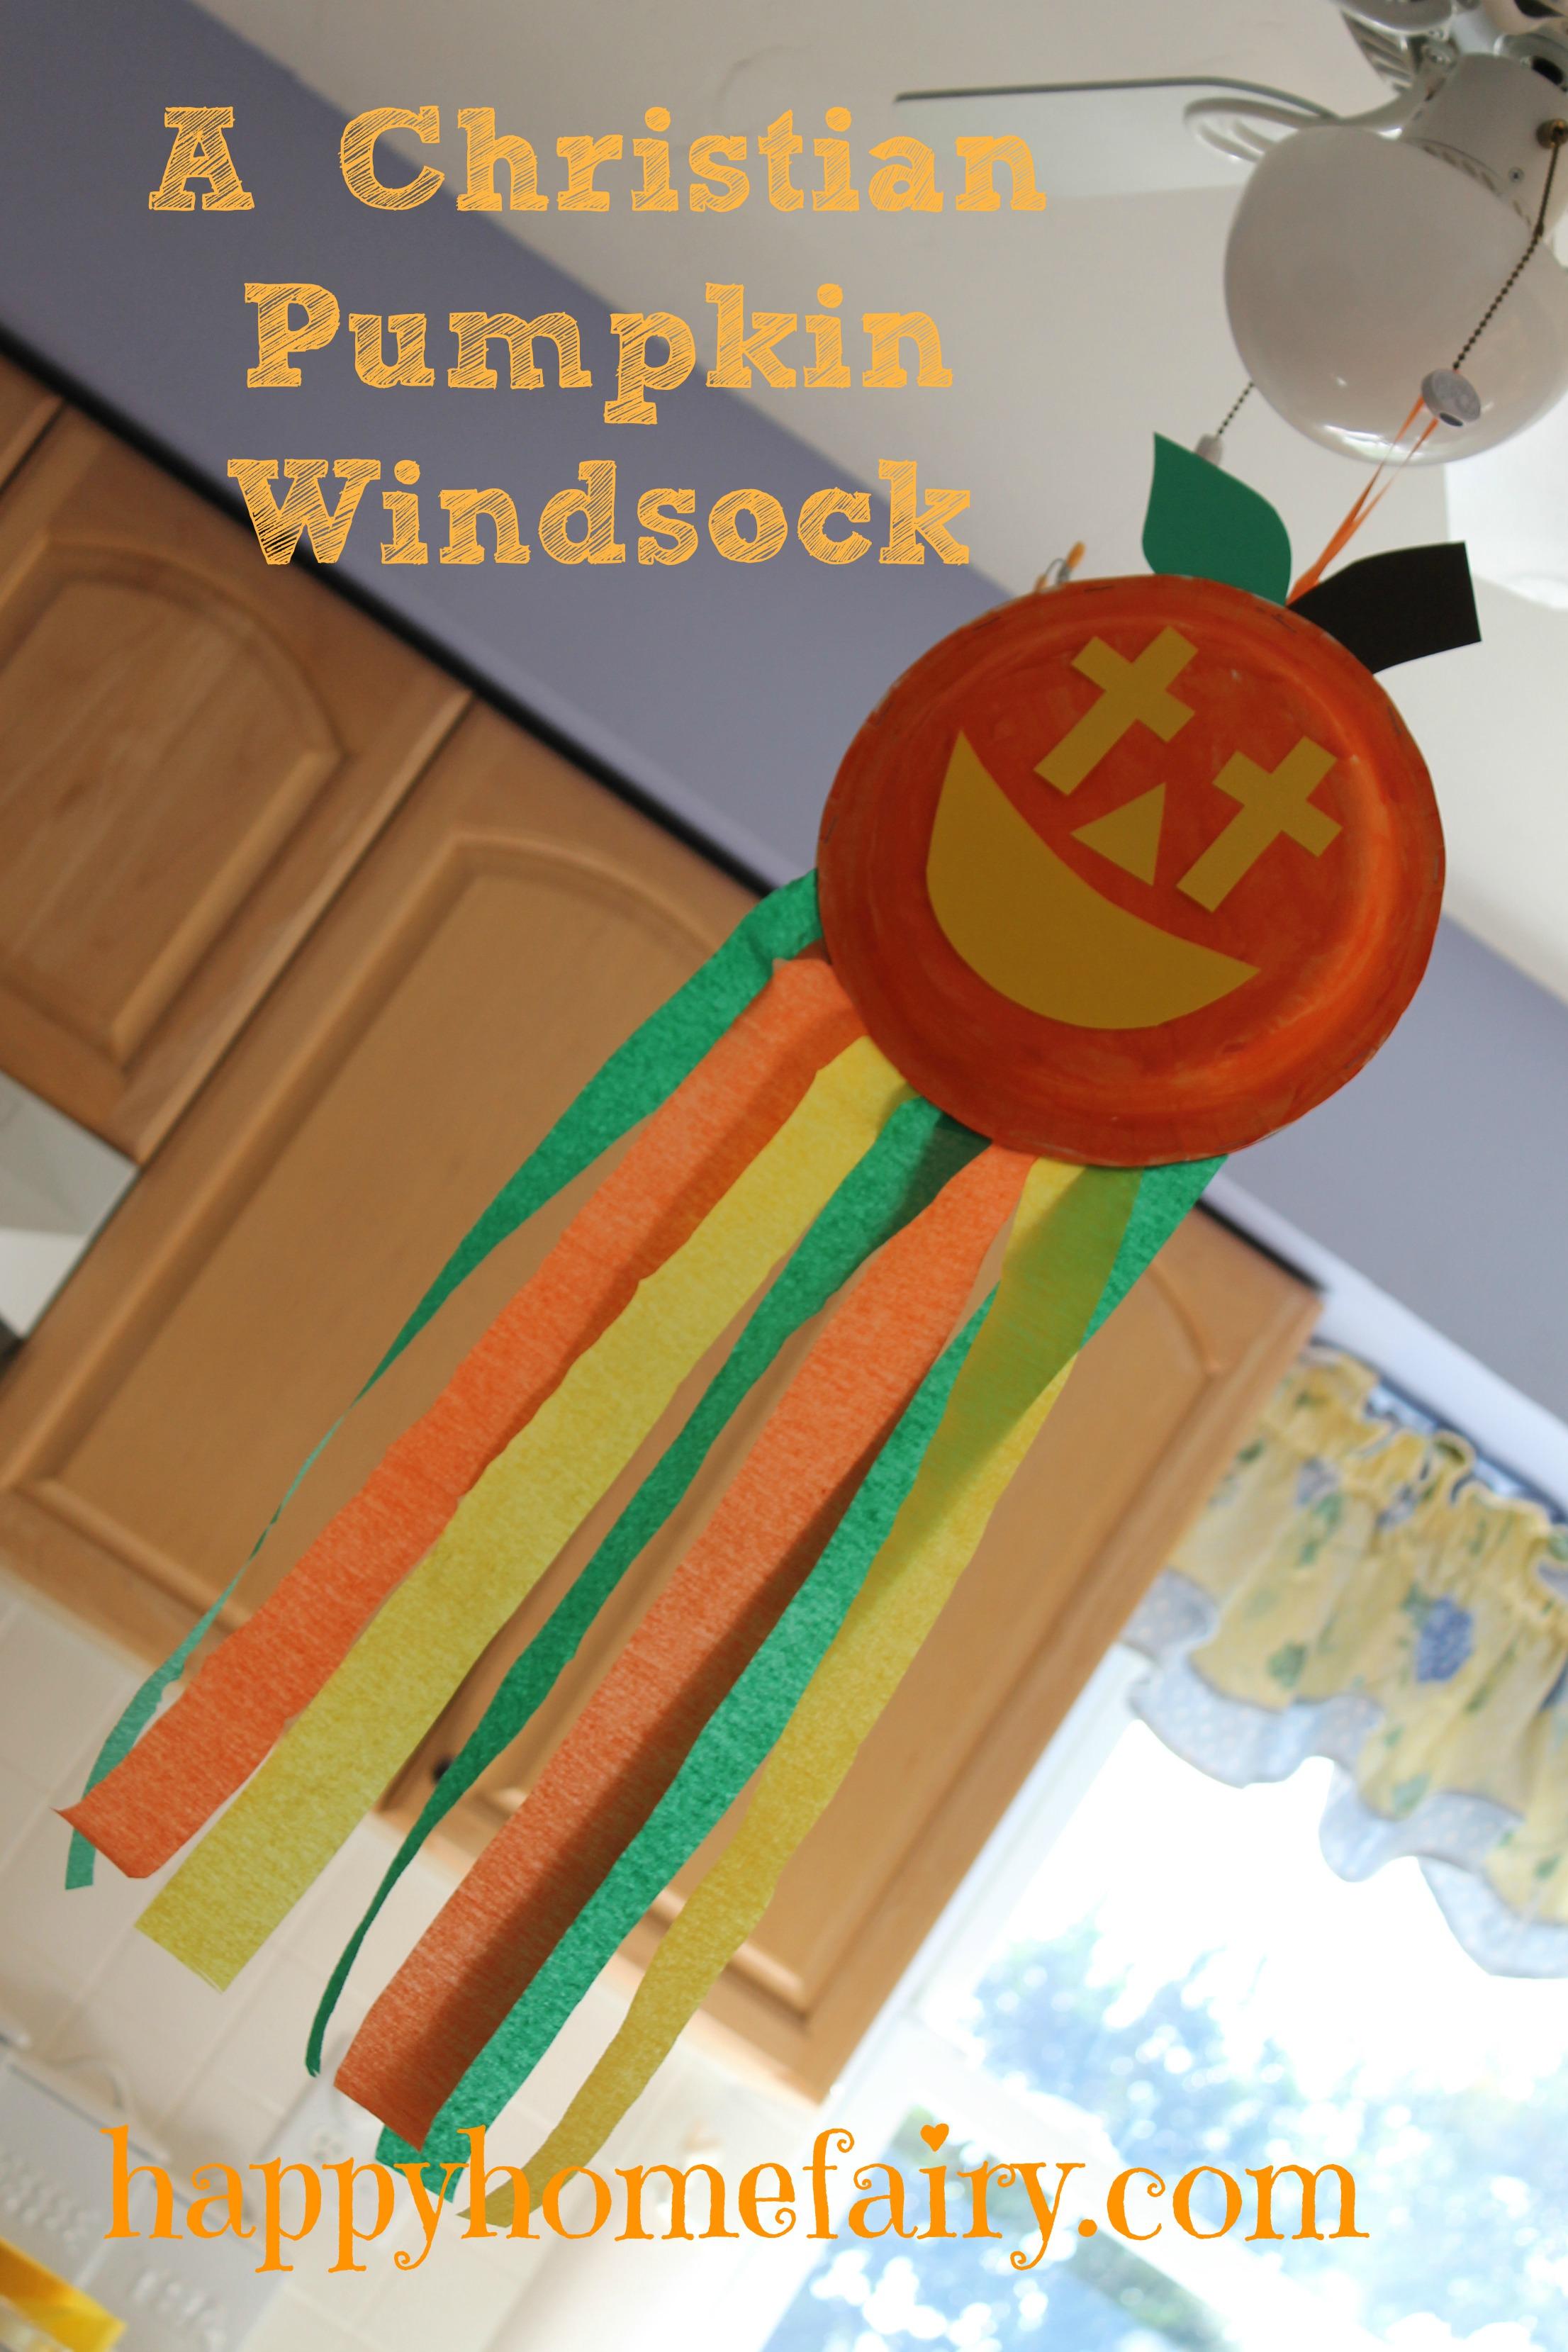 A Christian Pumpkin Windsock Craft Free Printable